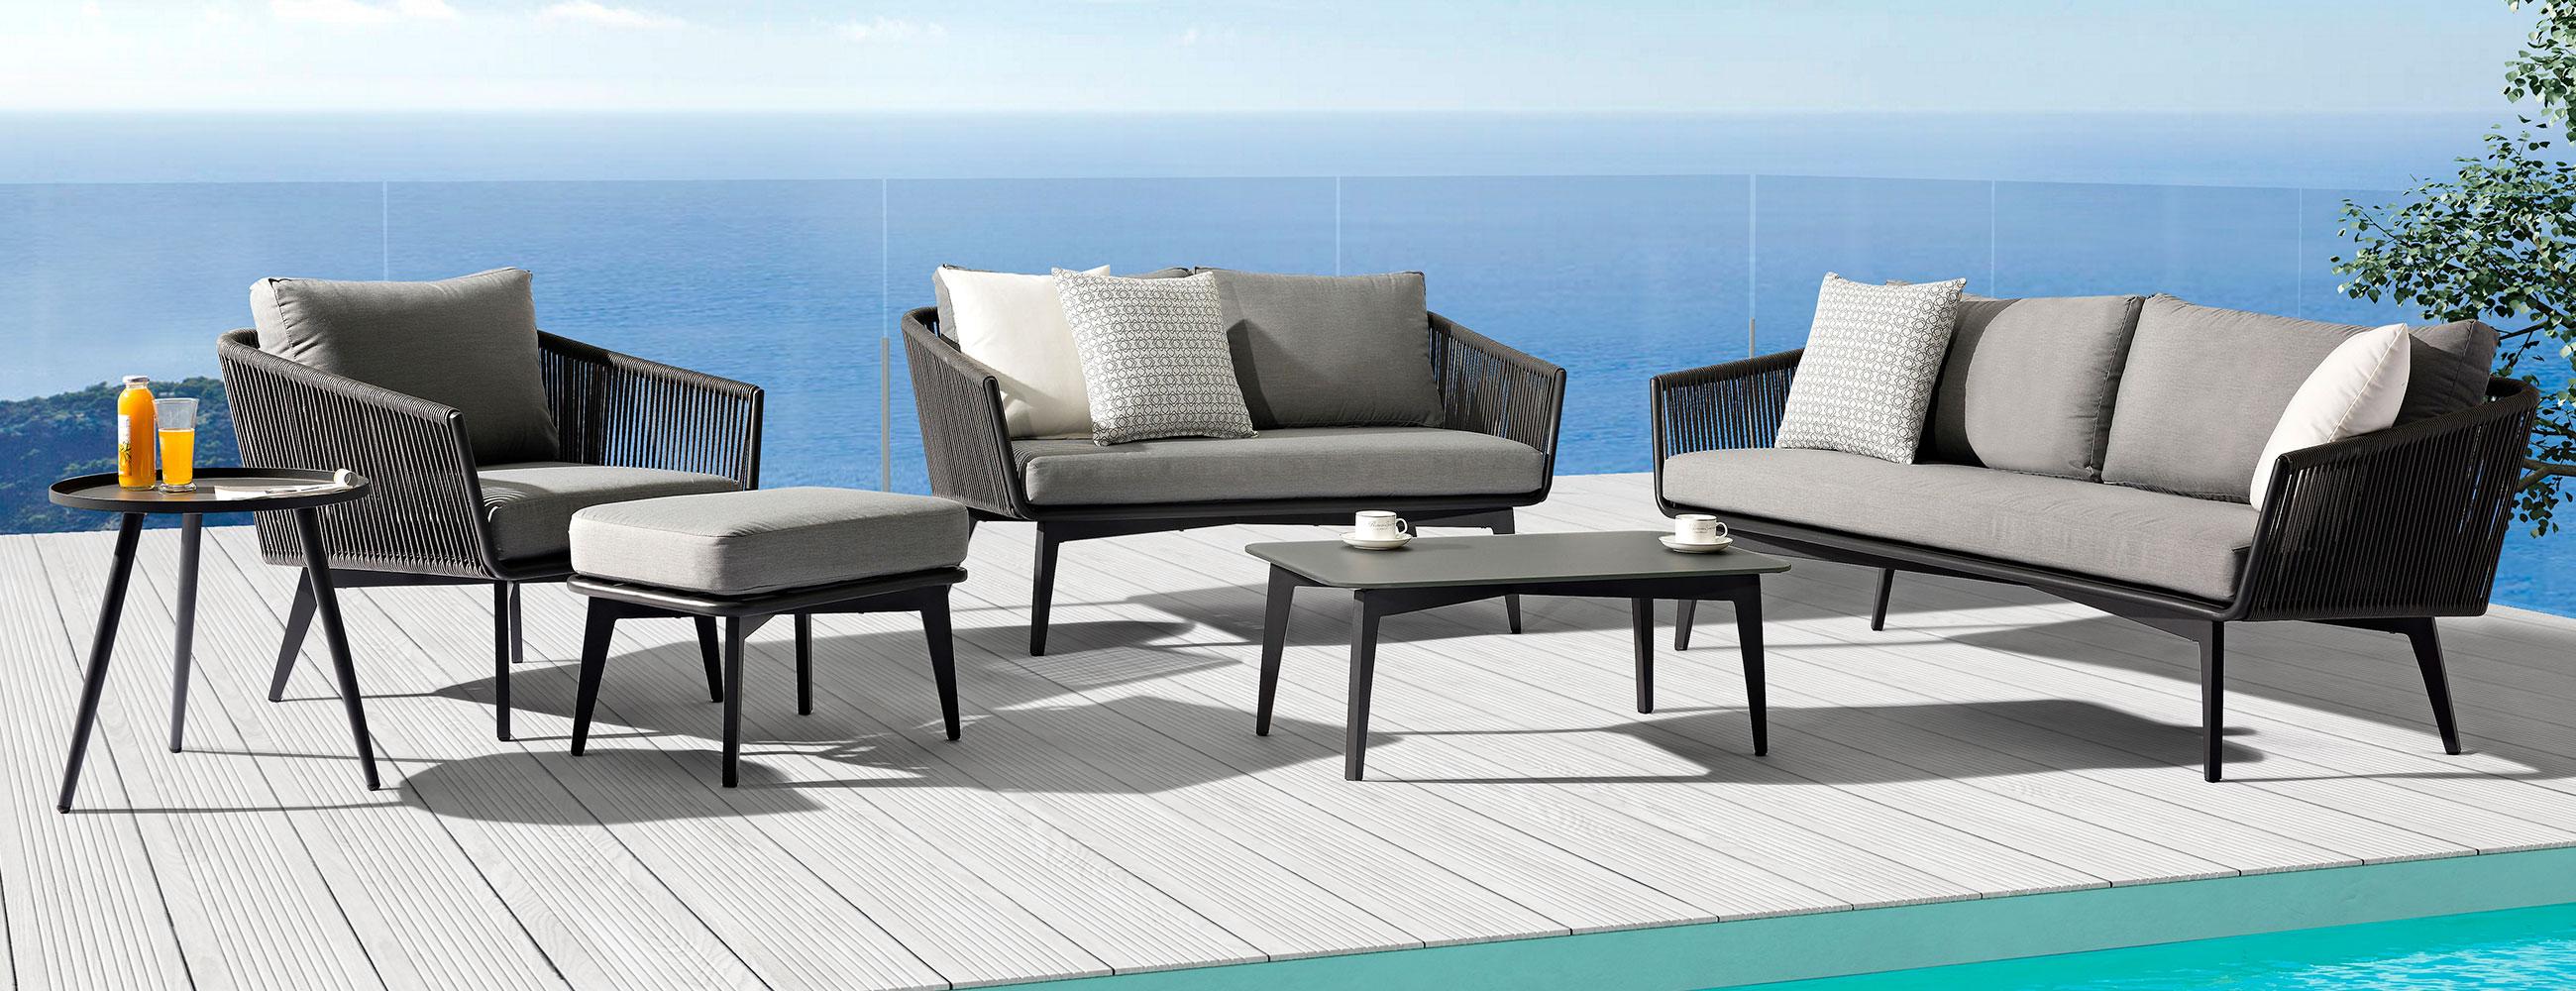 denova living & design AG